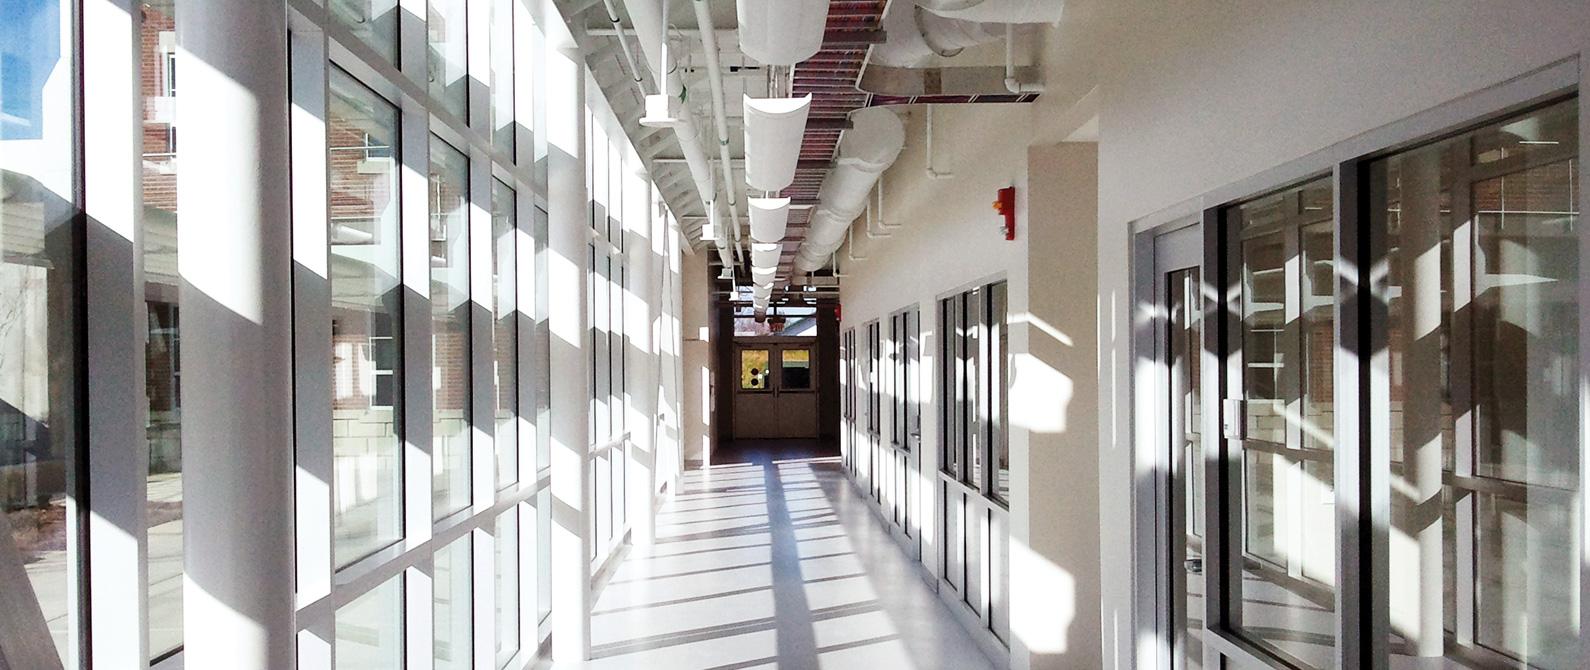 The Innovation Hub hallway